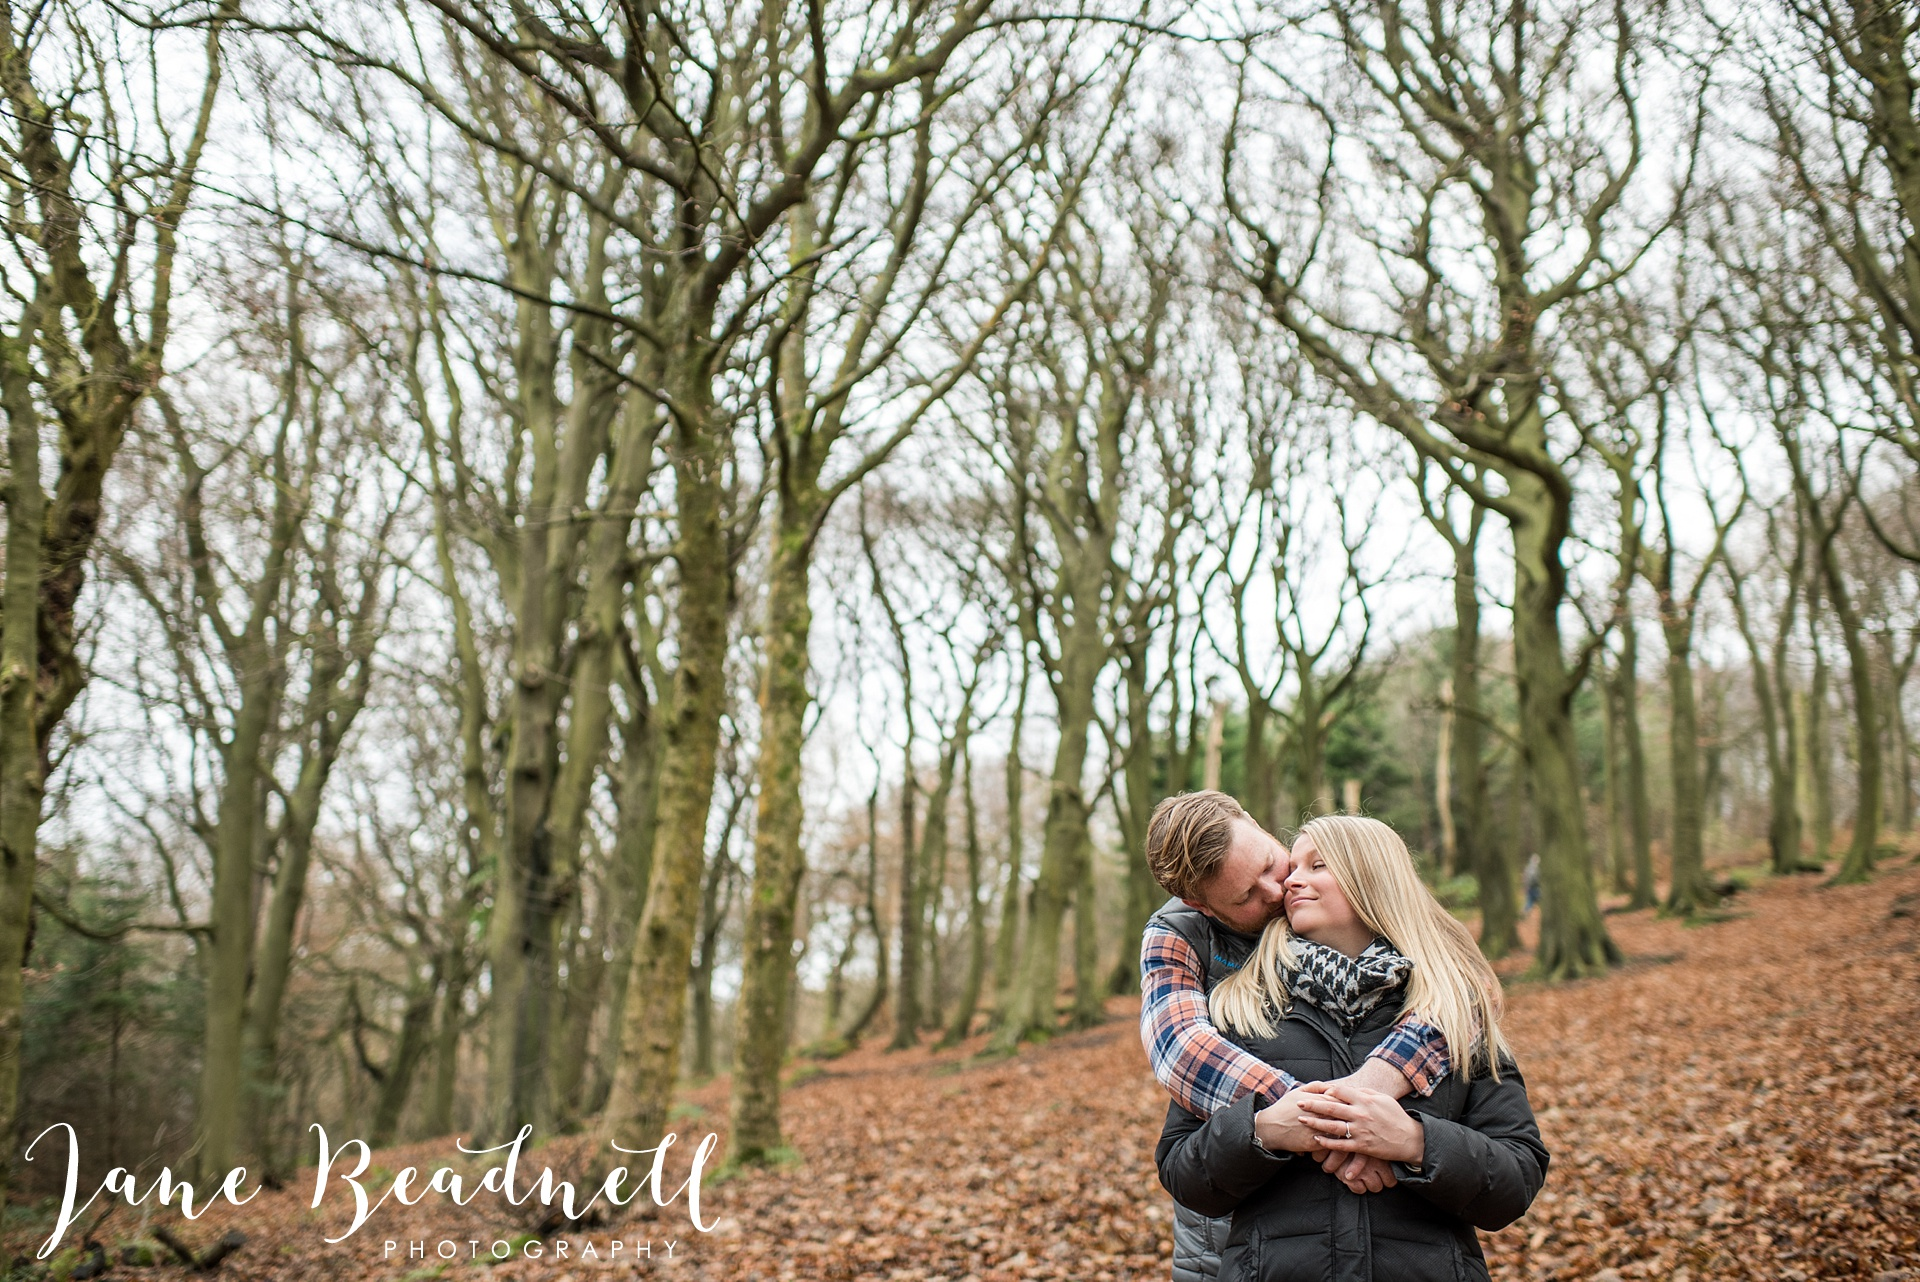 yorkshire-wedding-photographer-jane-beadnell-photography-uk-and-destination-wedding-photographer-engagement-shoot_0036